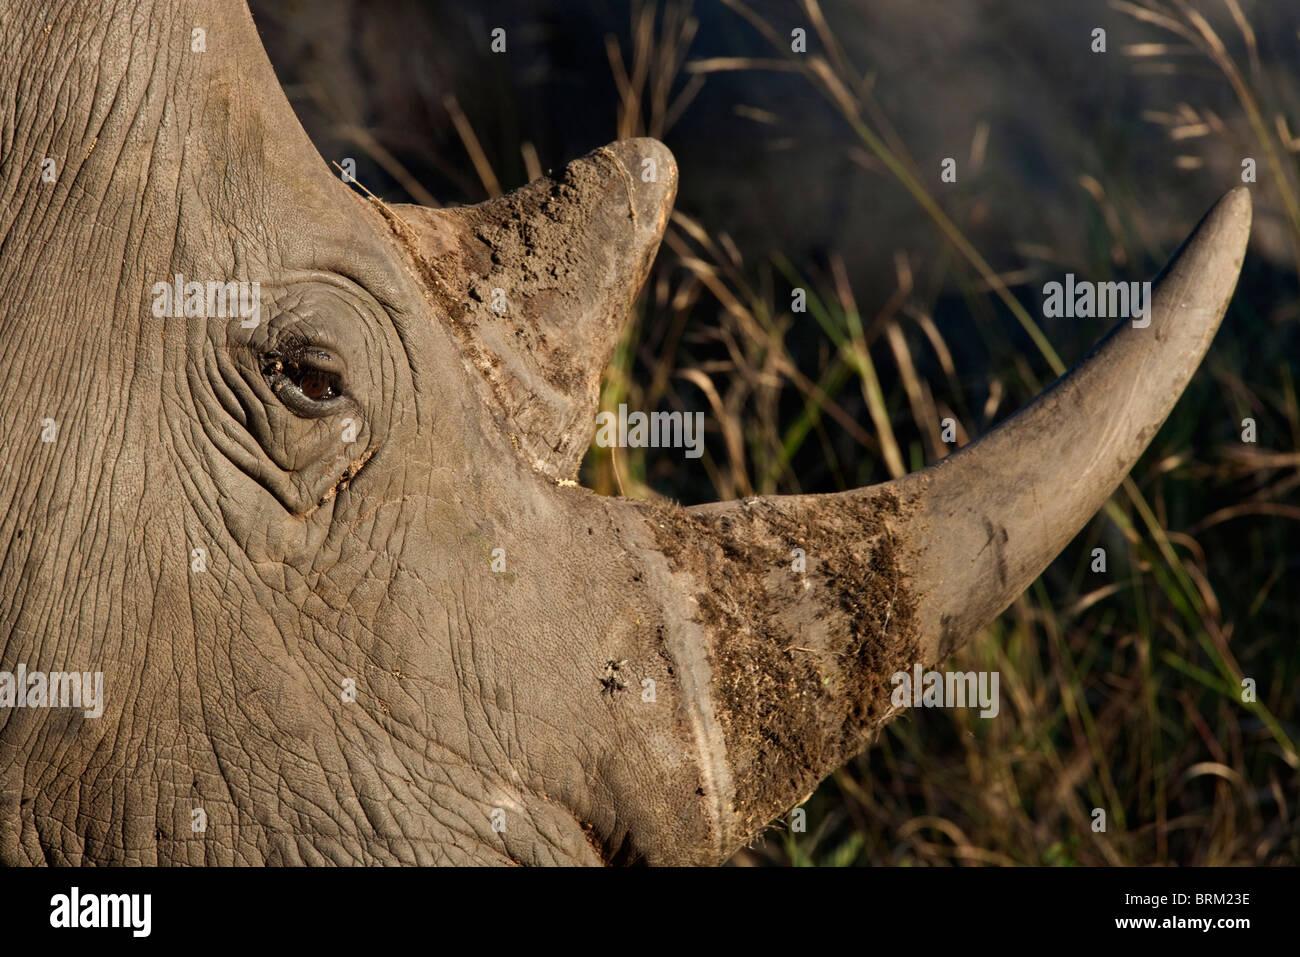 Closeup of a rhino horn and eye - Stock Image